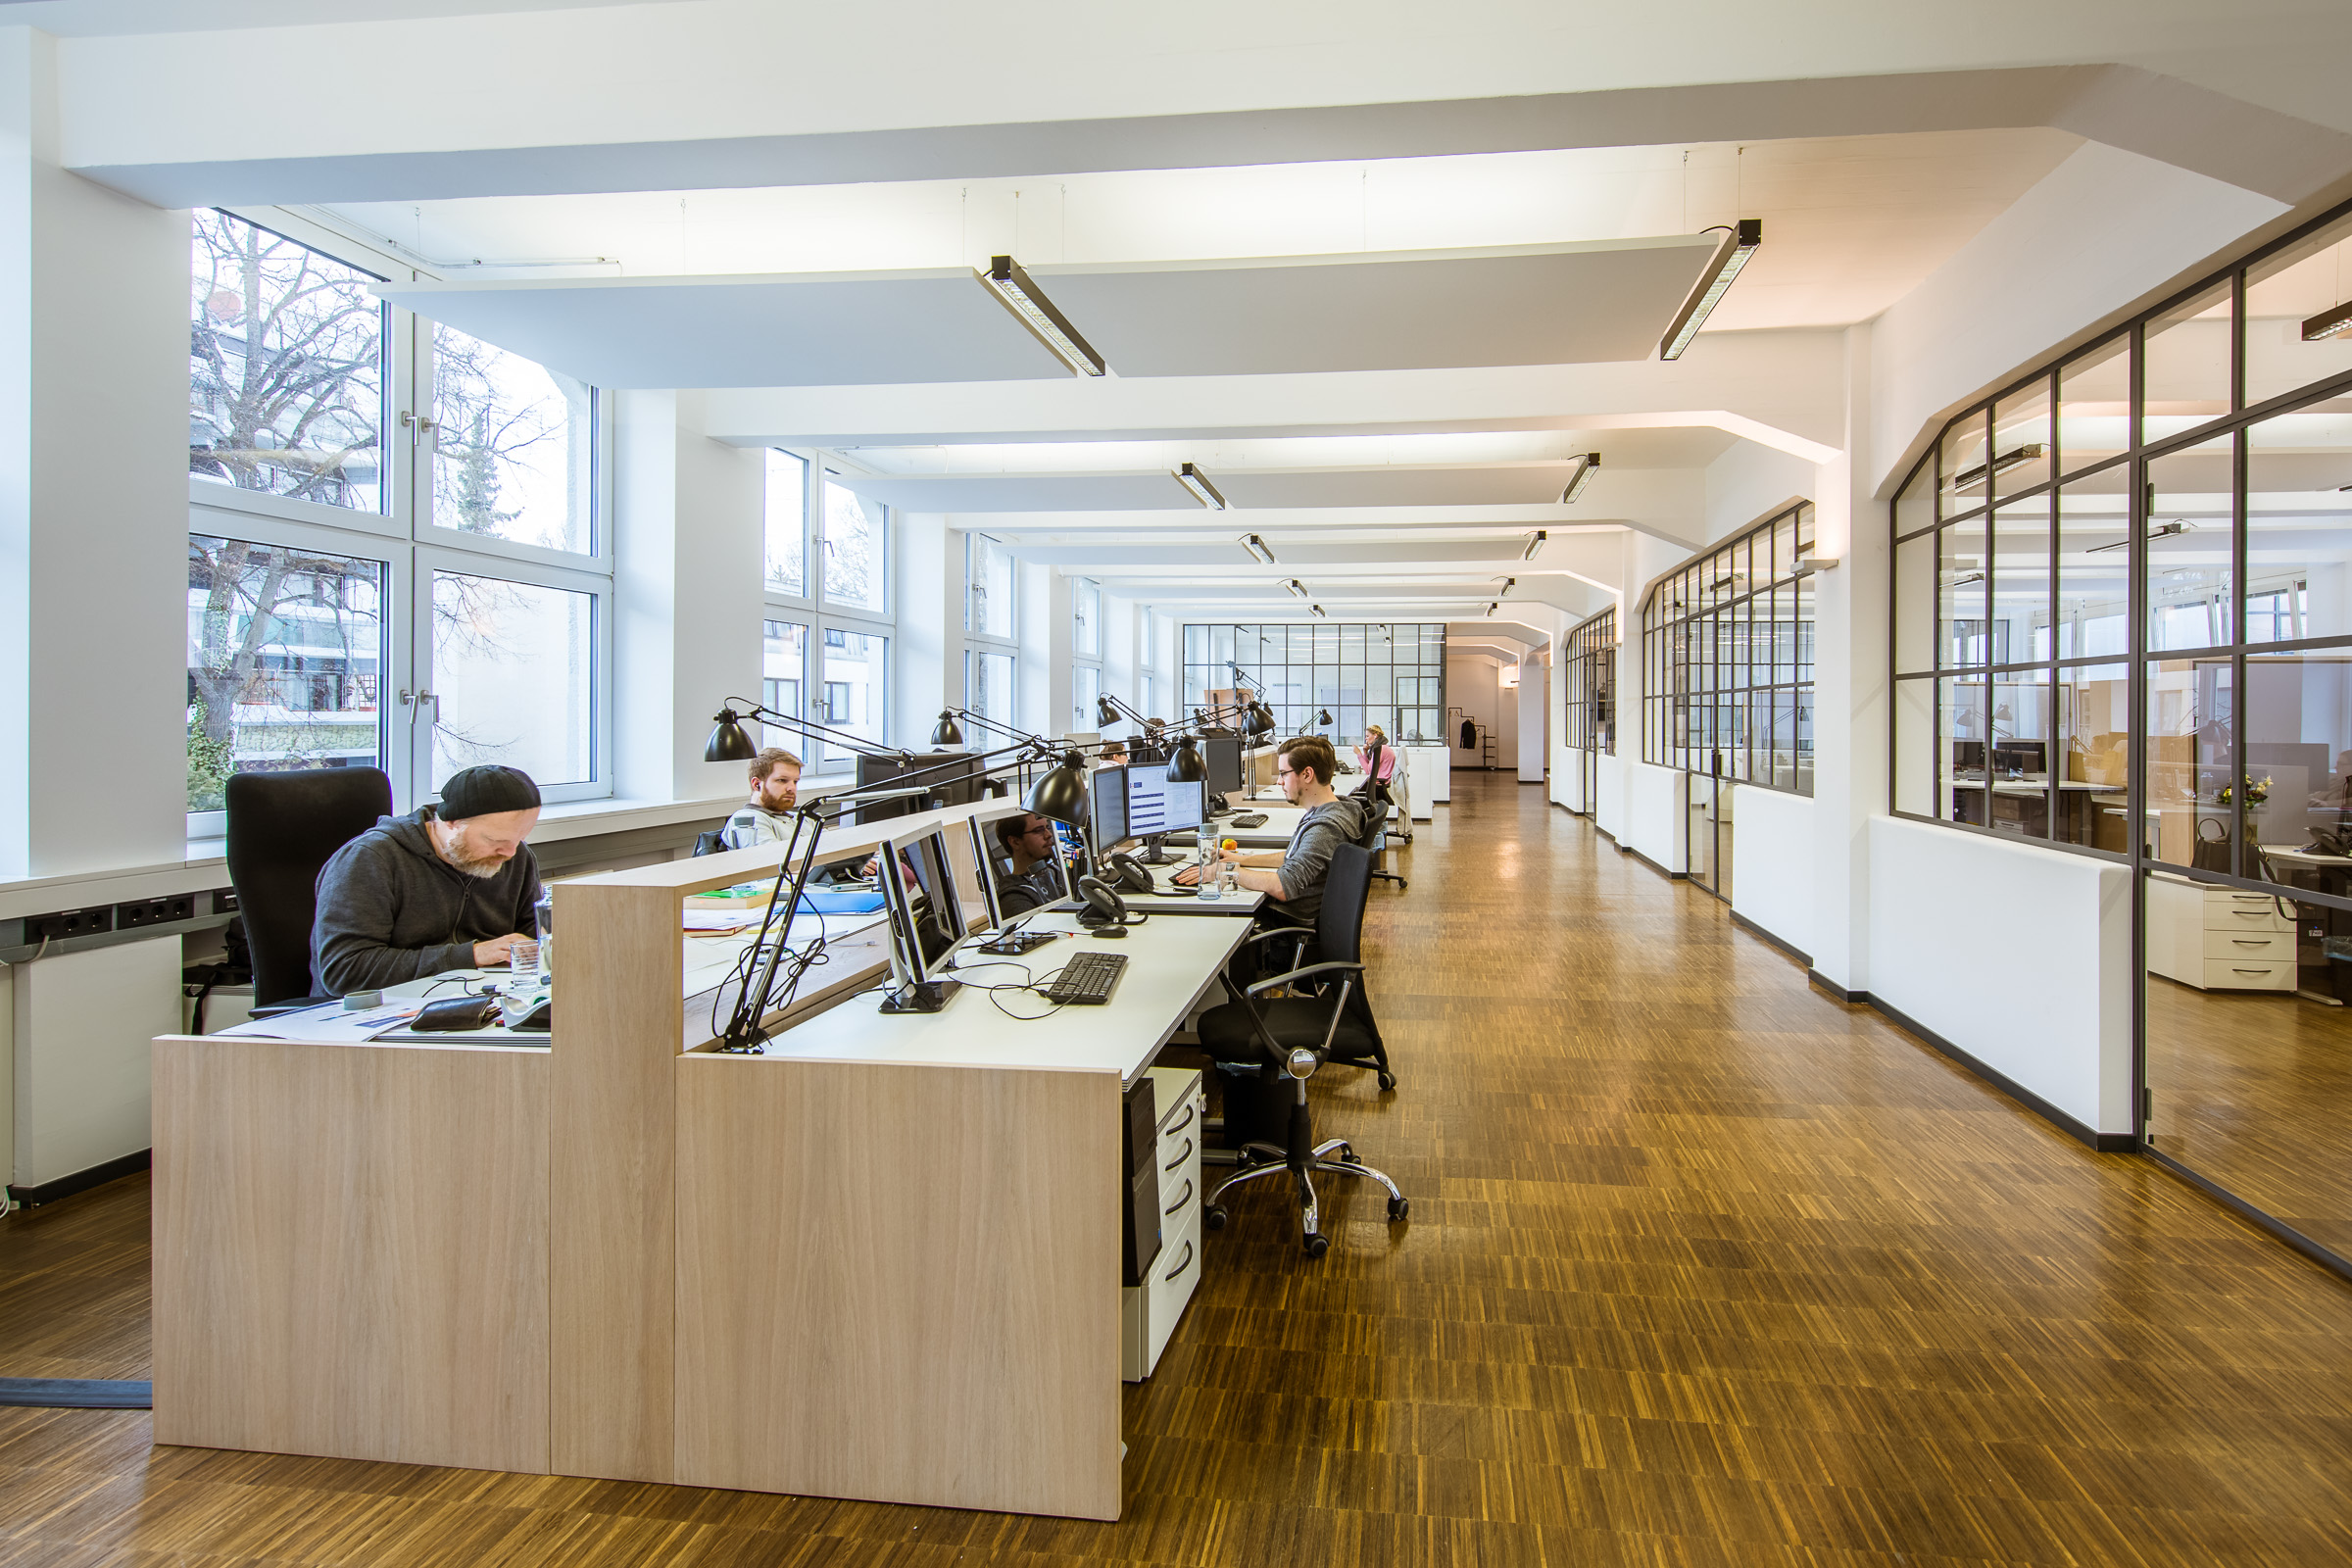 Buro Loft Techpilot Muenchenarchitektur